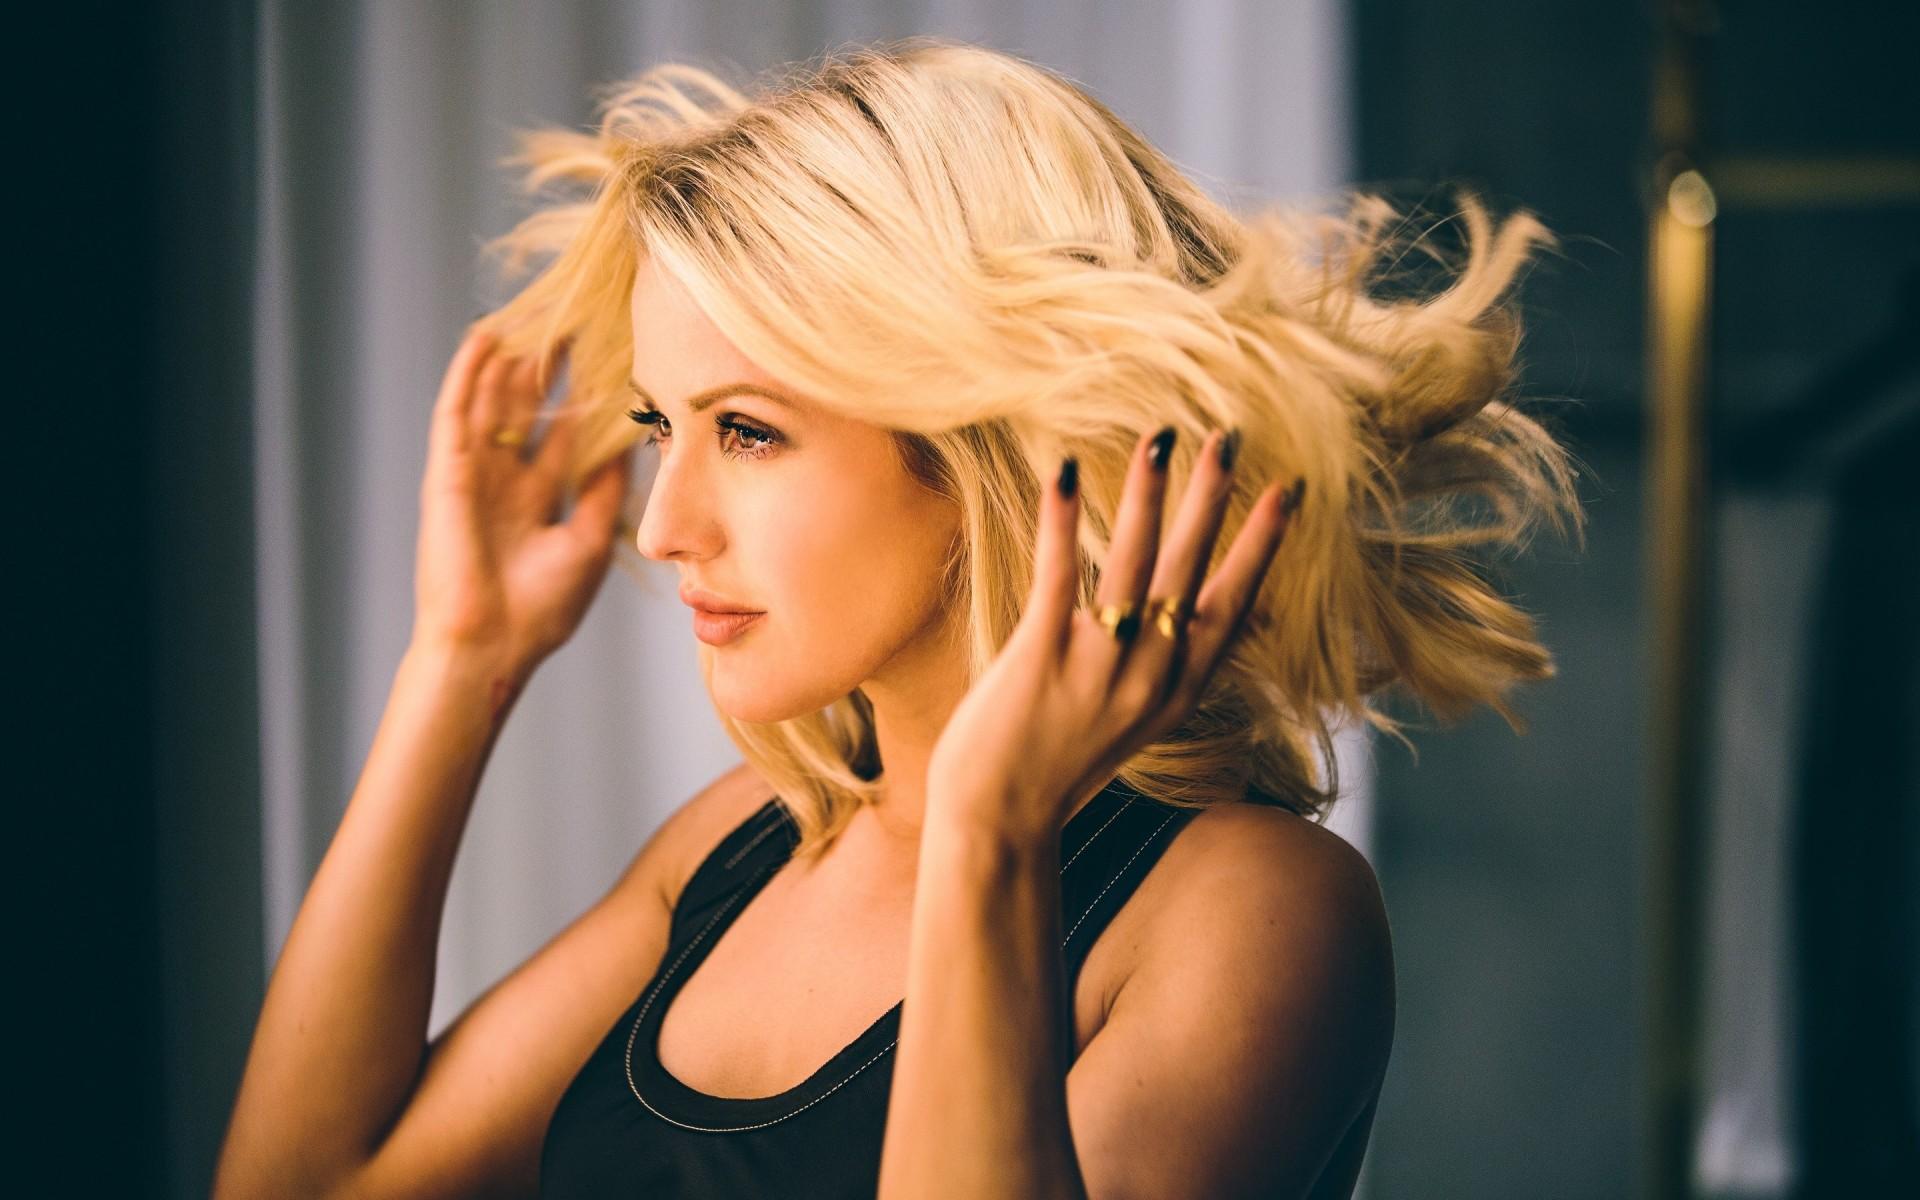 Beautiful Girl Face Hd Wallpaper Ellie Goulding 2017 Hd Wallpapers Hd Wallpapers Id 20971